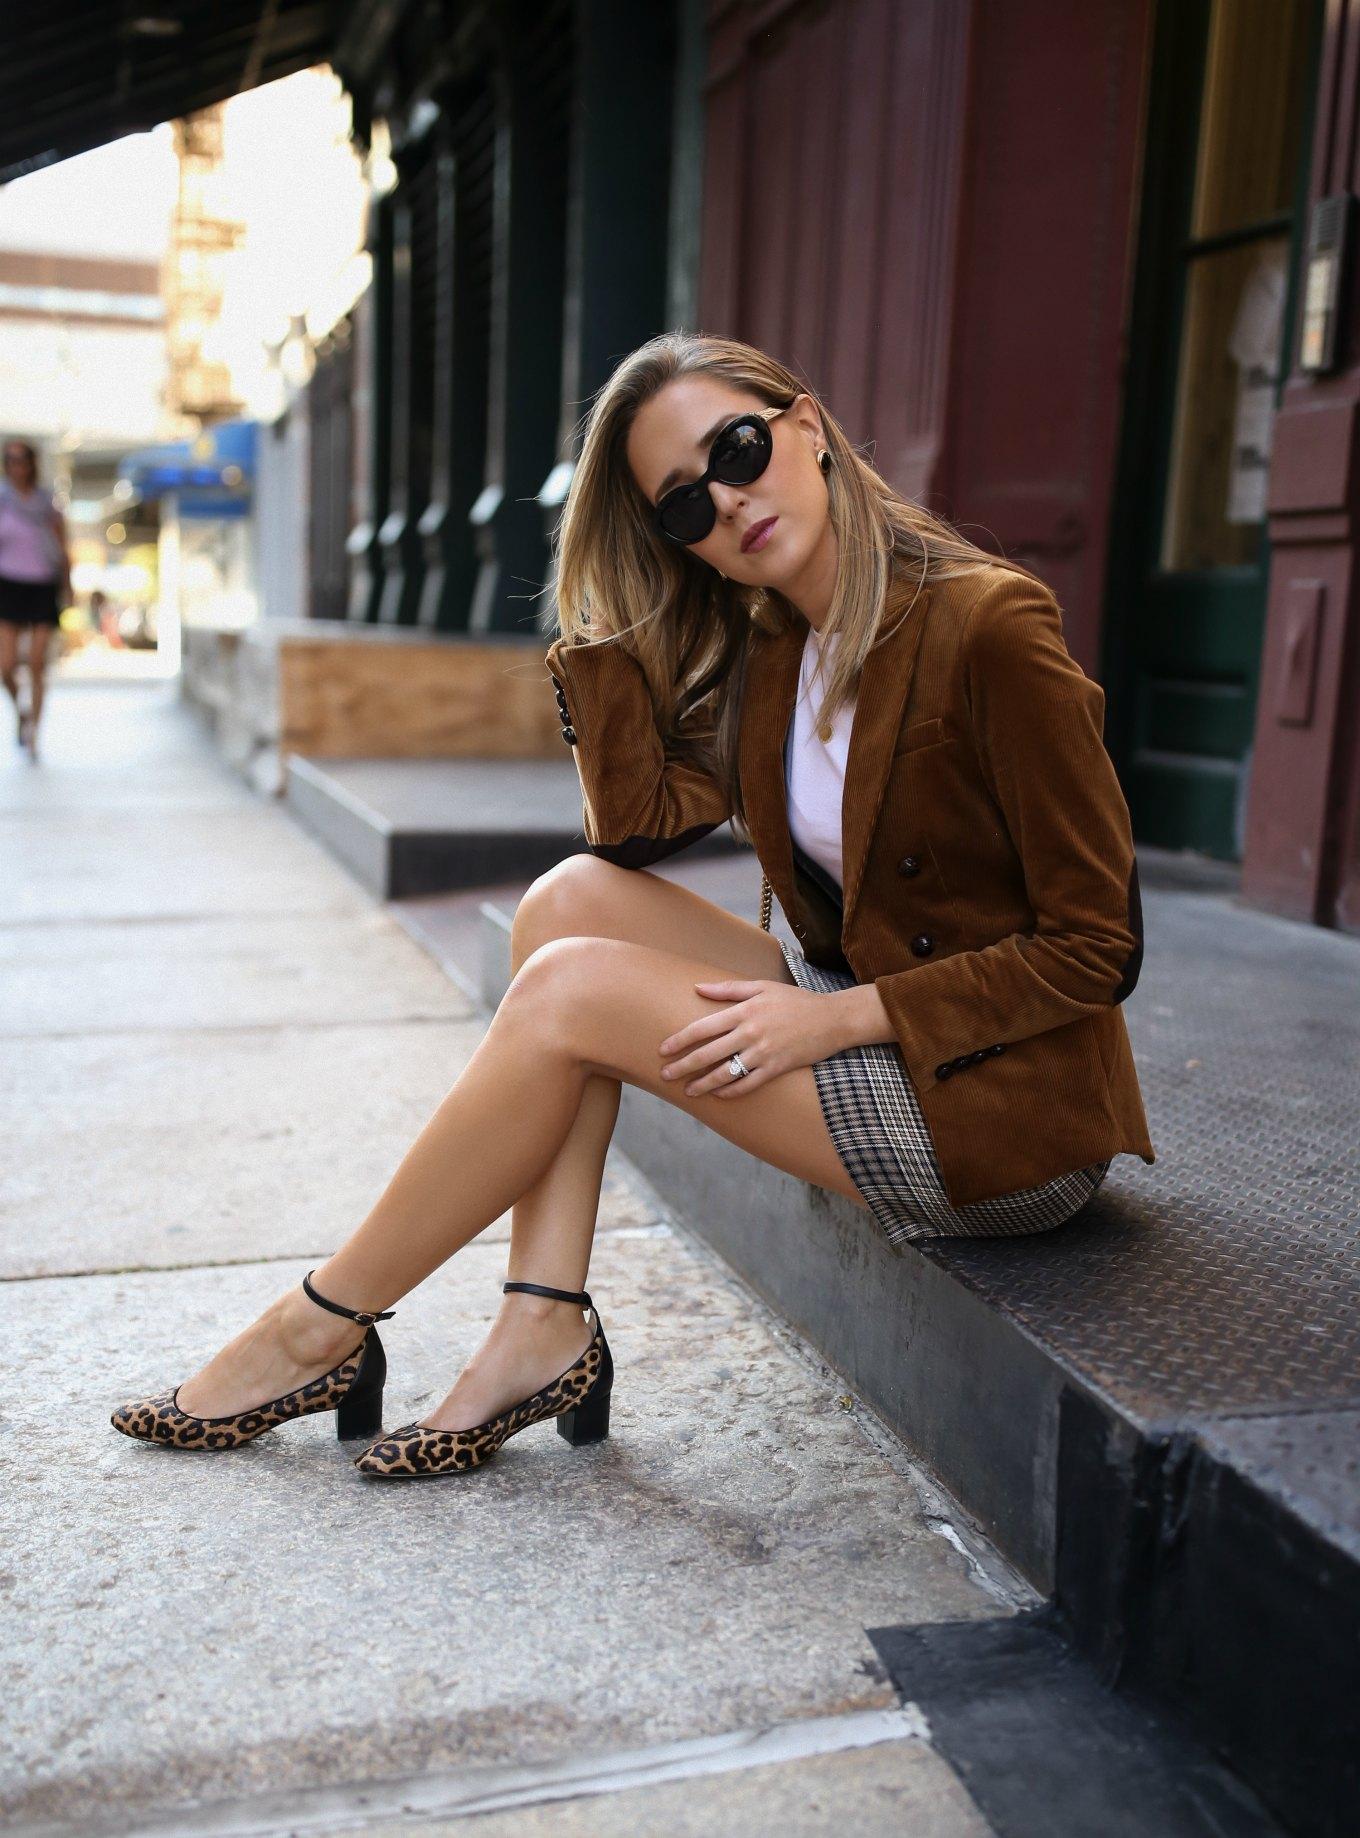 NYC fashion blogger Mary Orton of Memorandum wears a corduroy blazer, checked mini skirt, leopard print Sam Edelman ankle strap pumps and black cat eye sunglasses